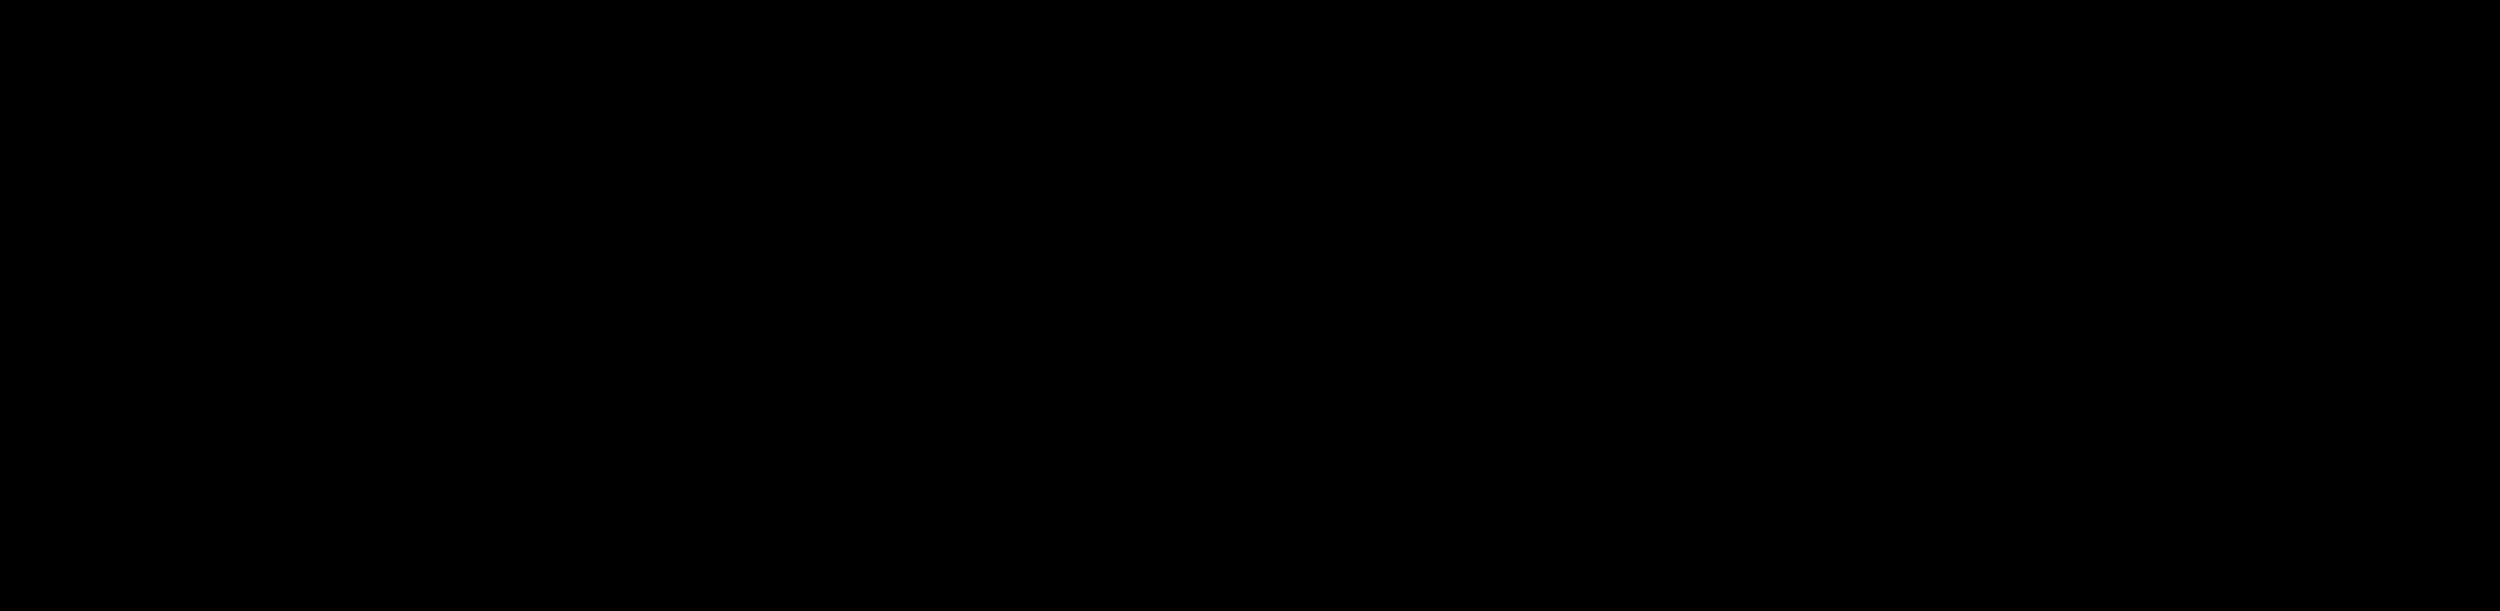 Creatool_logo_black.png